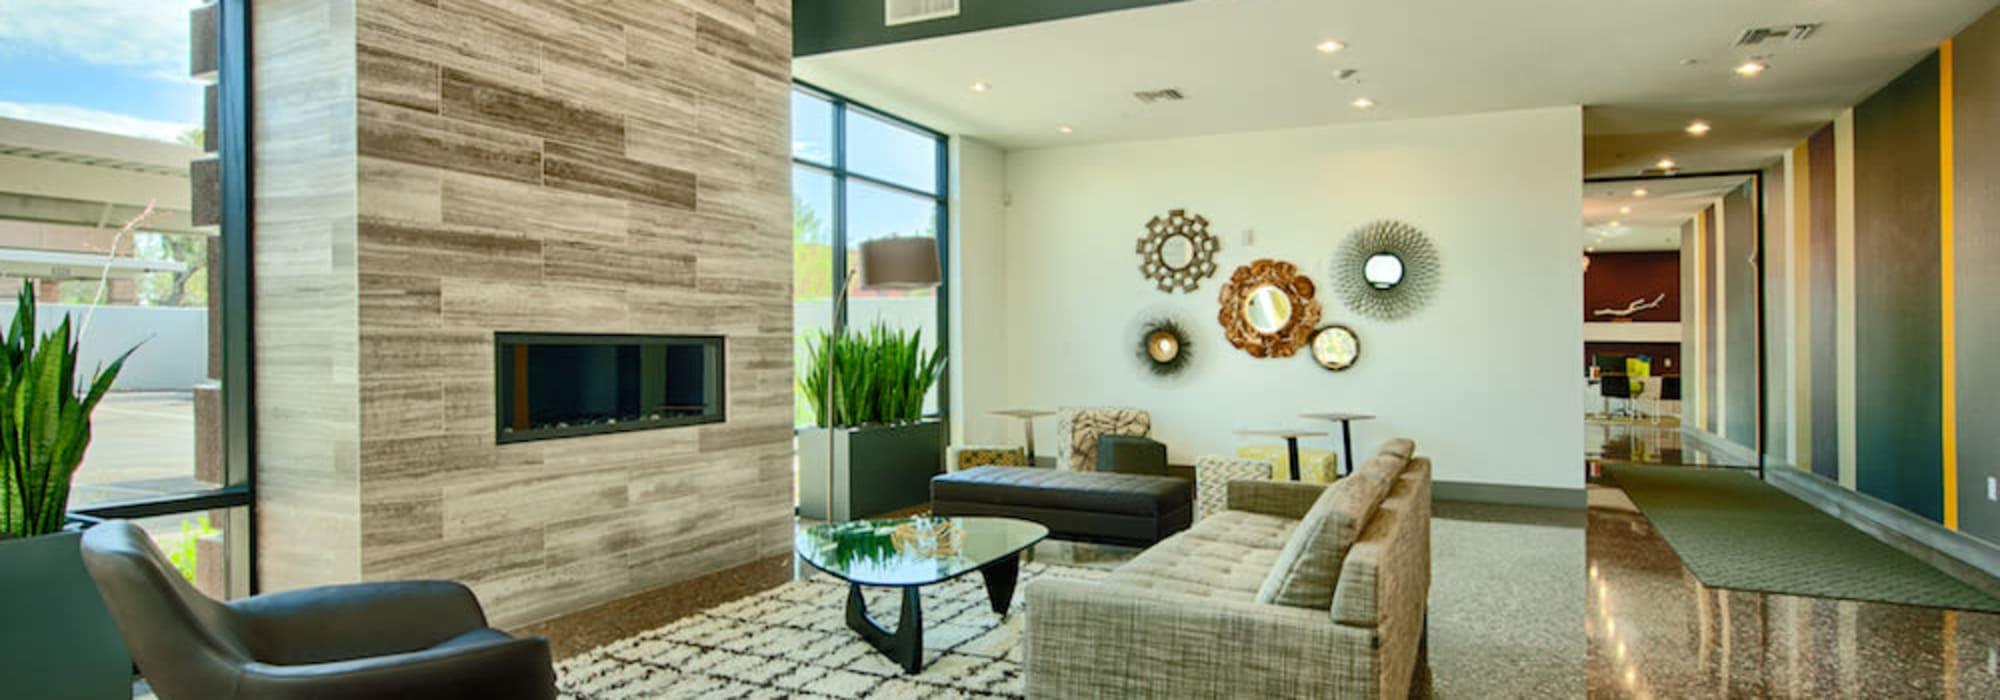 Luxury lunge room at Cactus Forty-2 in Phoenix, Arizona